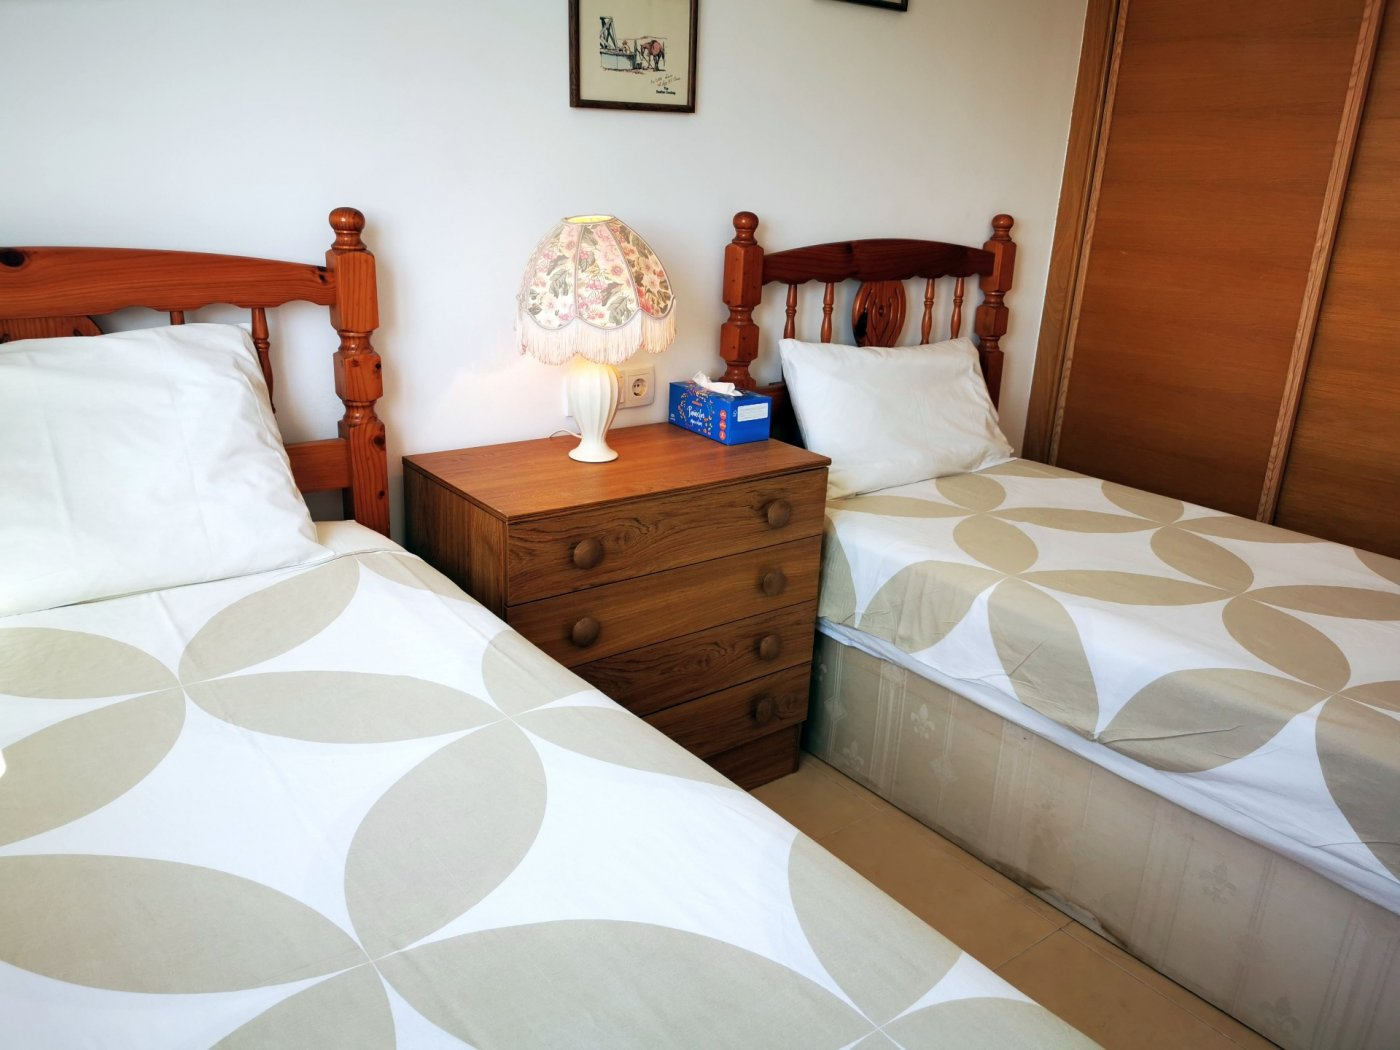 Gallery Image 11 of Key-Ready 2 Bedroom Apartment Overlooking the Citrus Groves in Jardin 10, Condado de Alhama